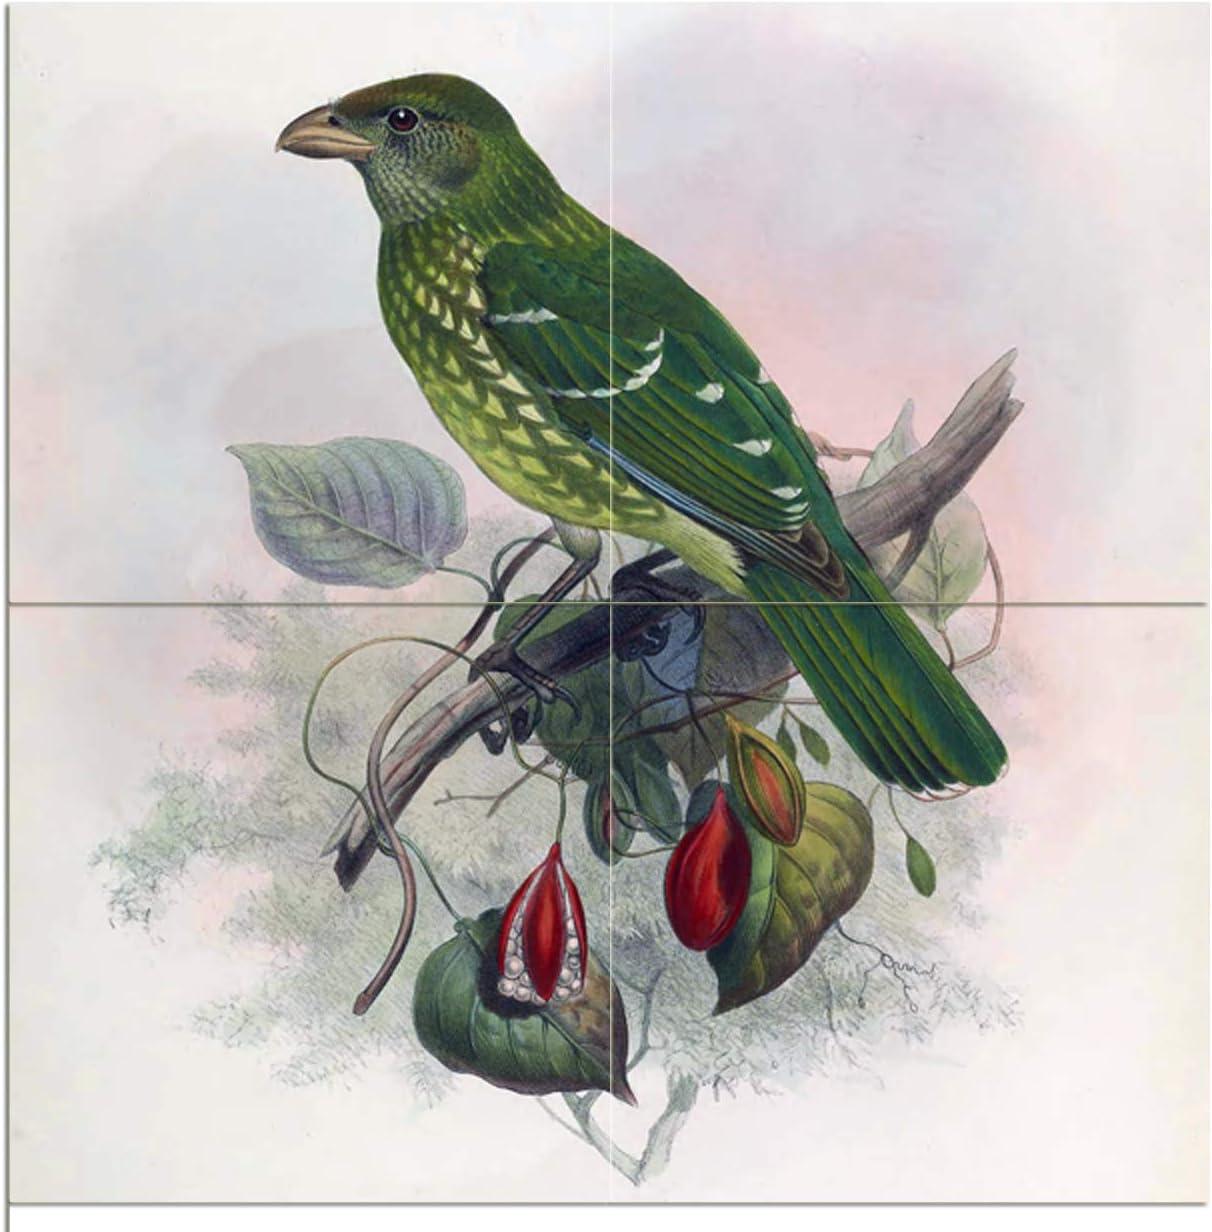 Tile Mural Tropical Green Bird Sale Elliot by Max 76% OFF Kitchen Giraund Daniel